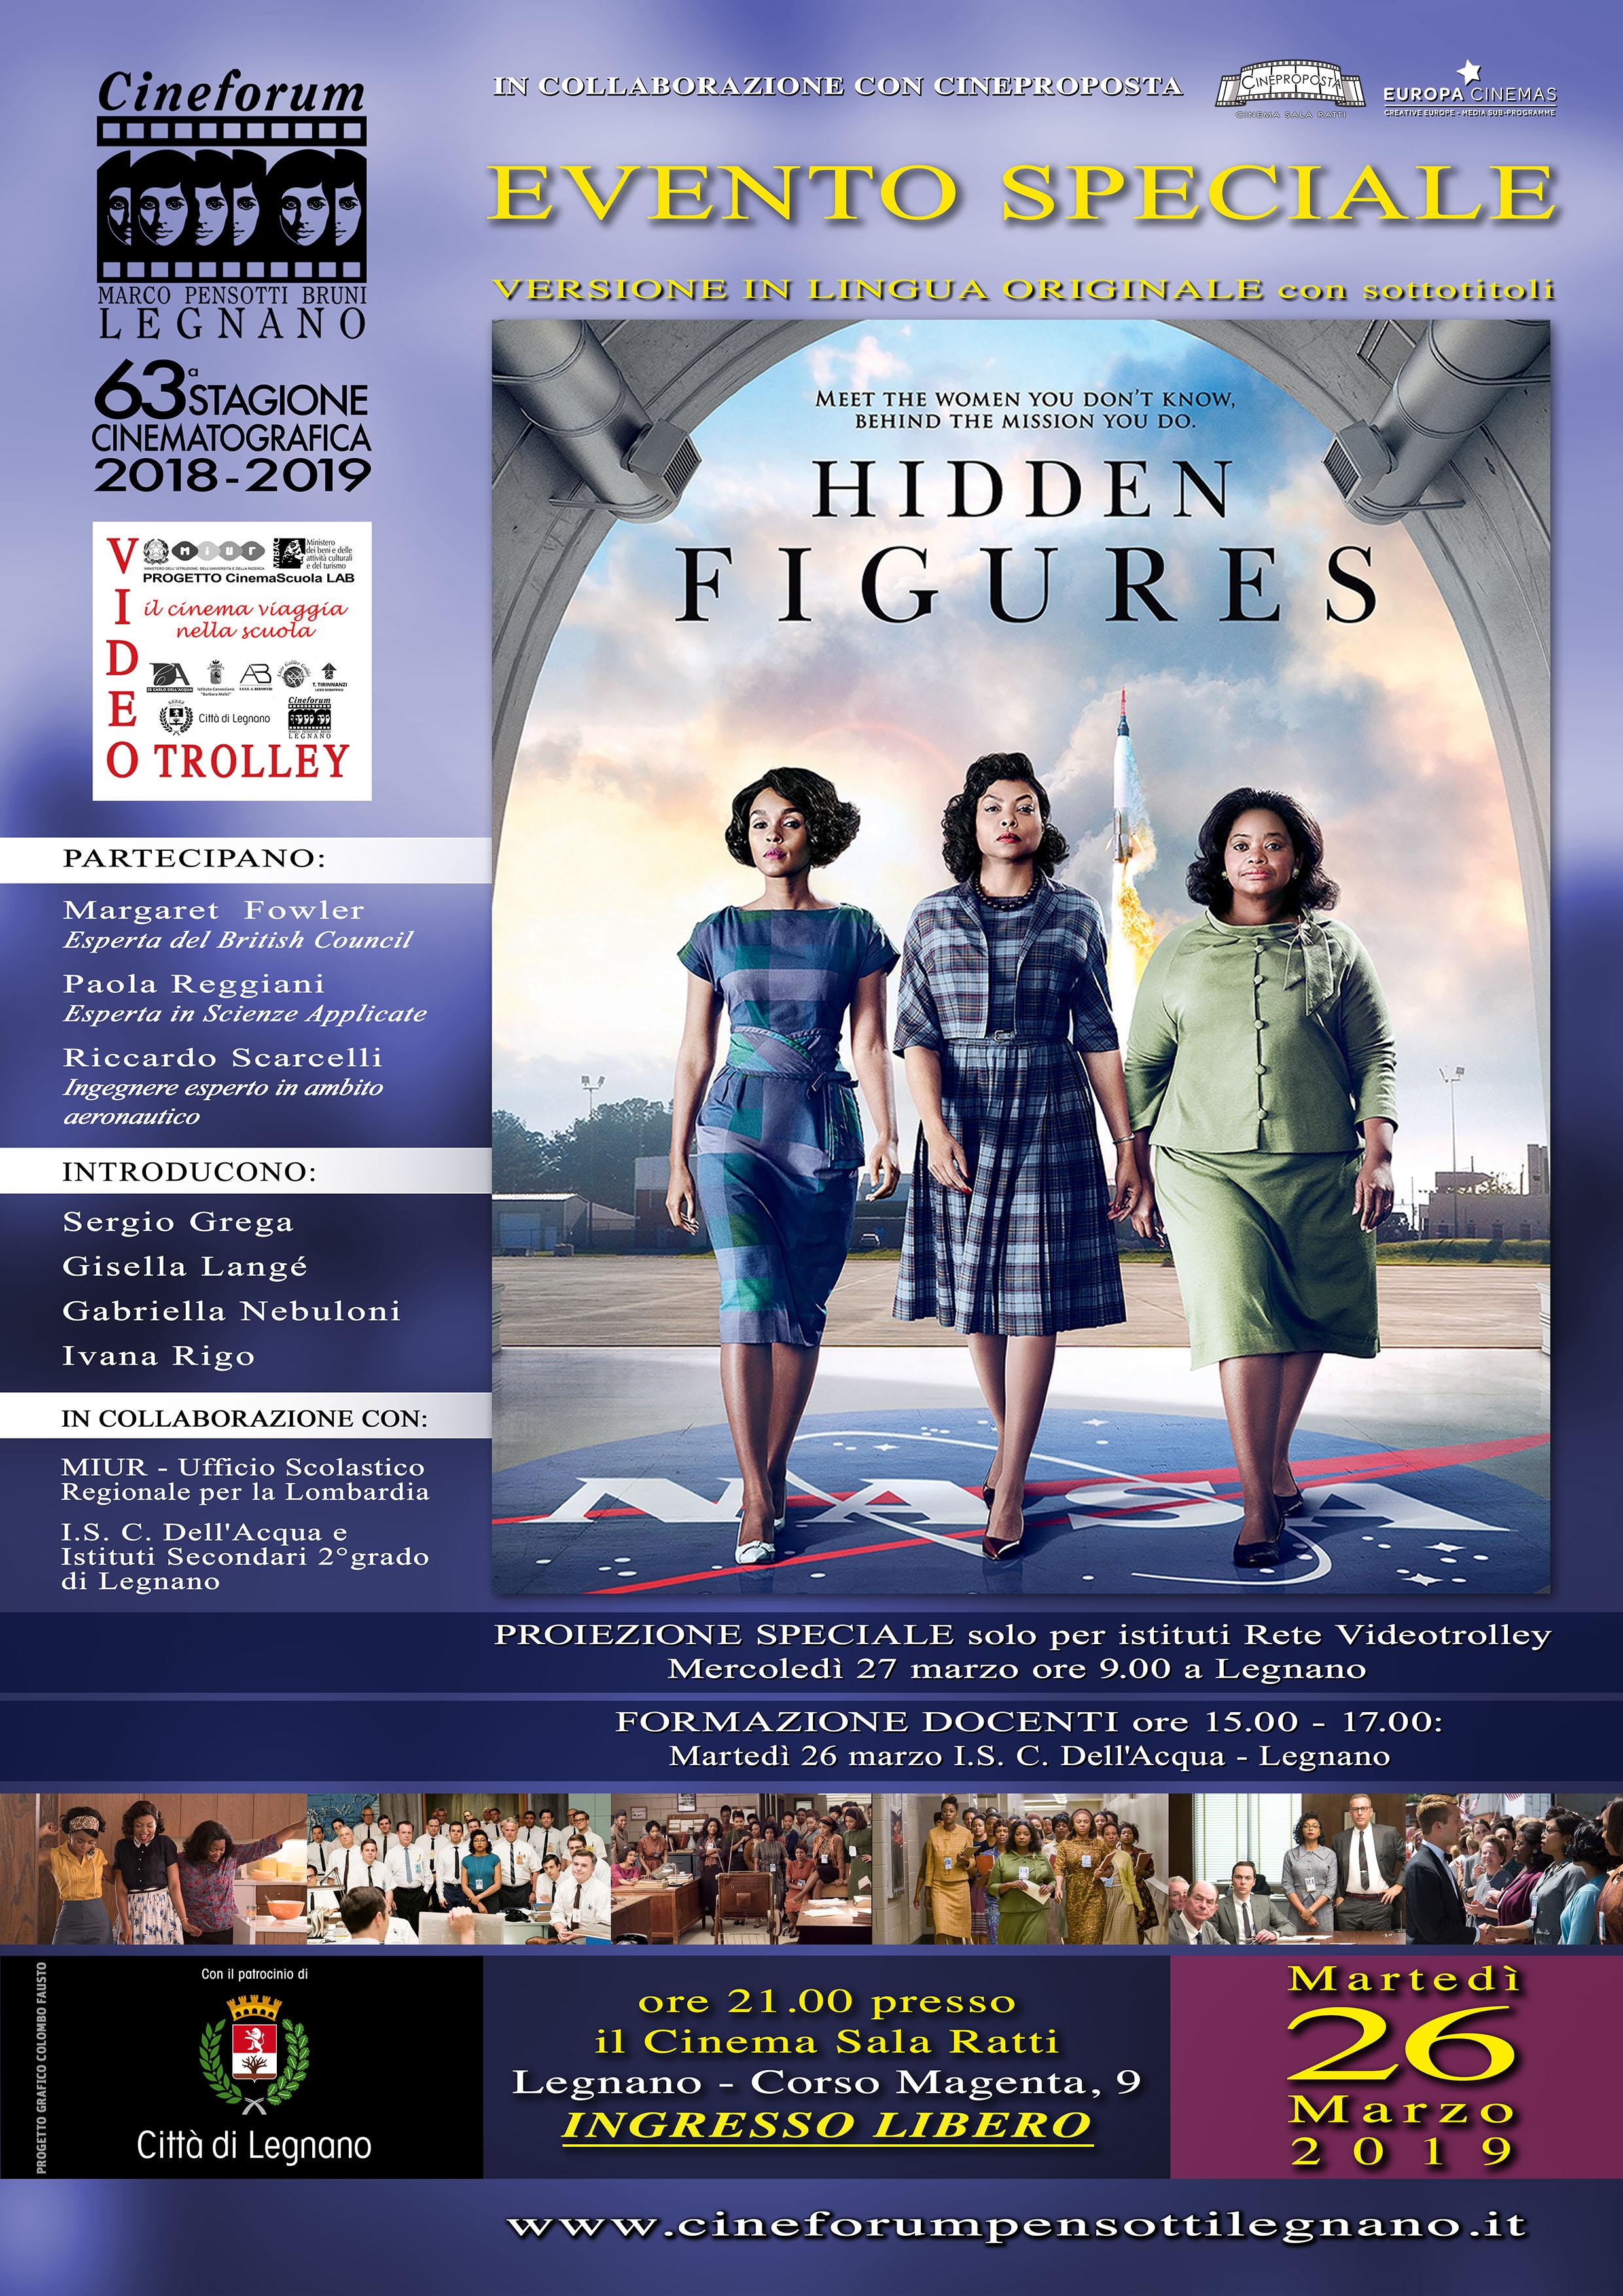 Volantino Evento Speciale - ''Hidden Figures''